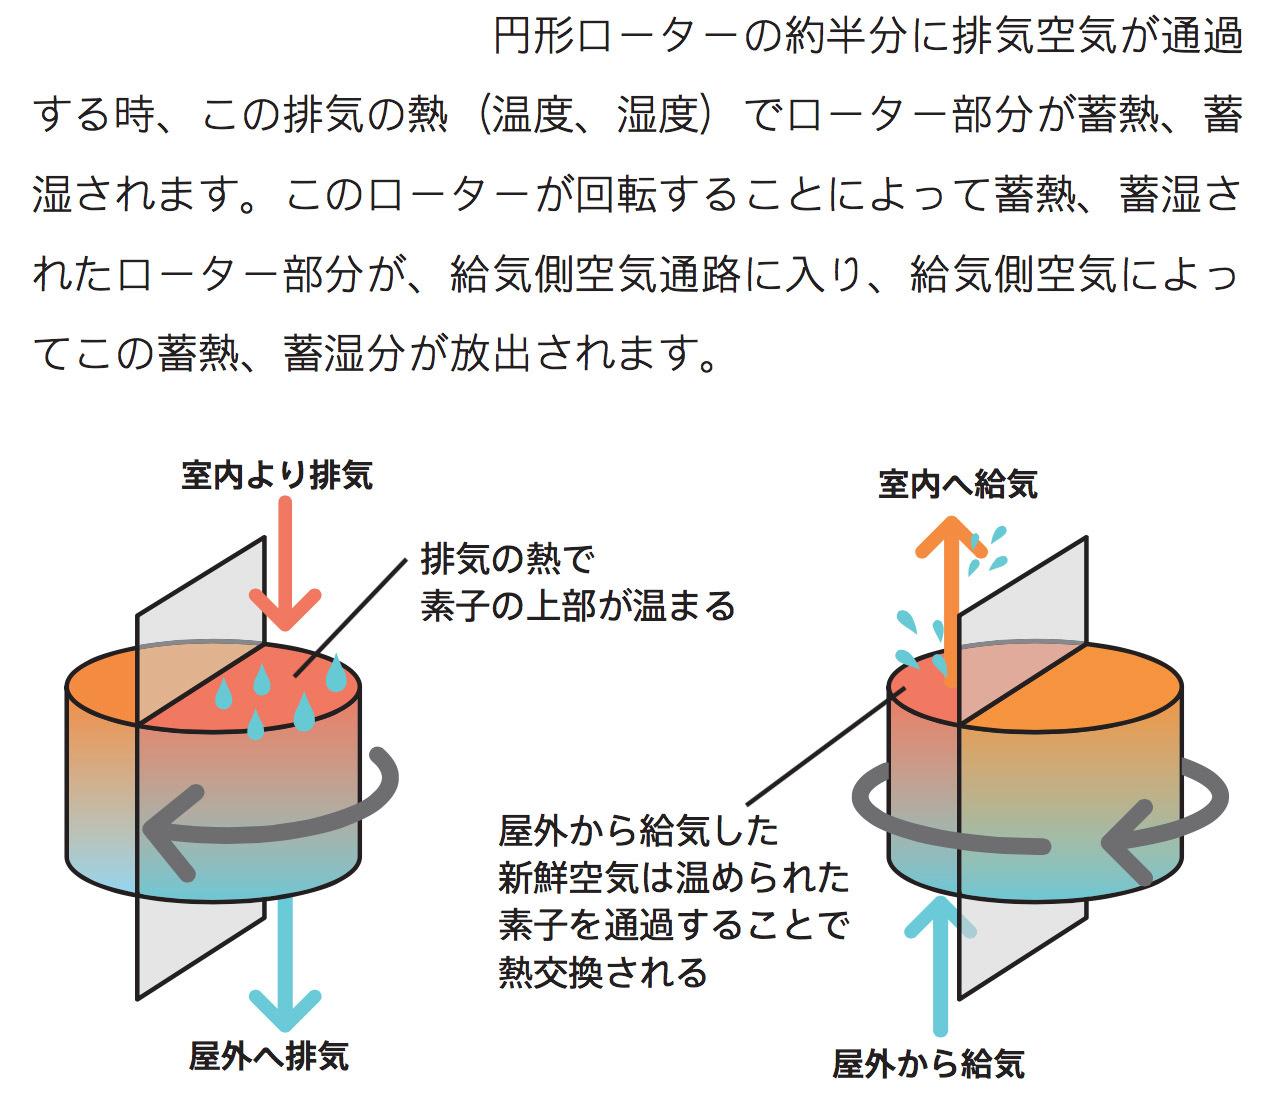 Q1住宅L2二ツ井:熱・水蒸気回収型熱交換換気システムRDKR_e0054299_08591002.jpg